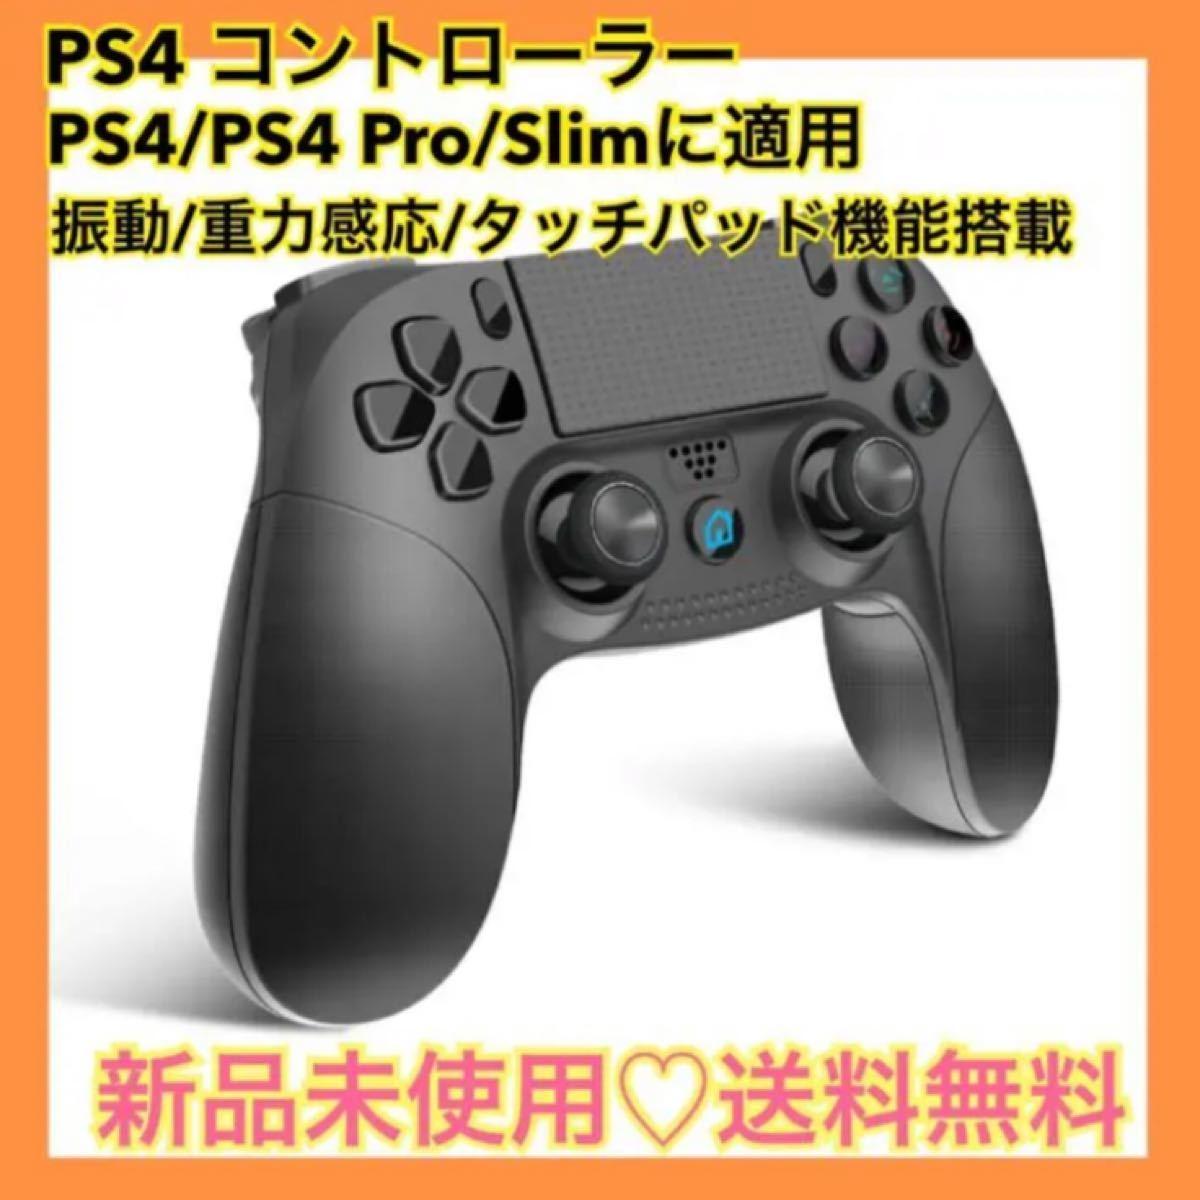 PS4 コントローラー PS4/PS4 Pro/Slimに適用 振動 重力 感応